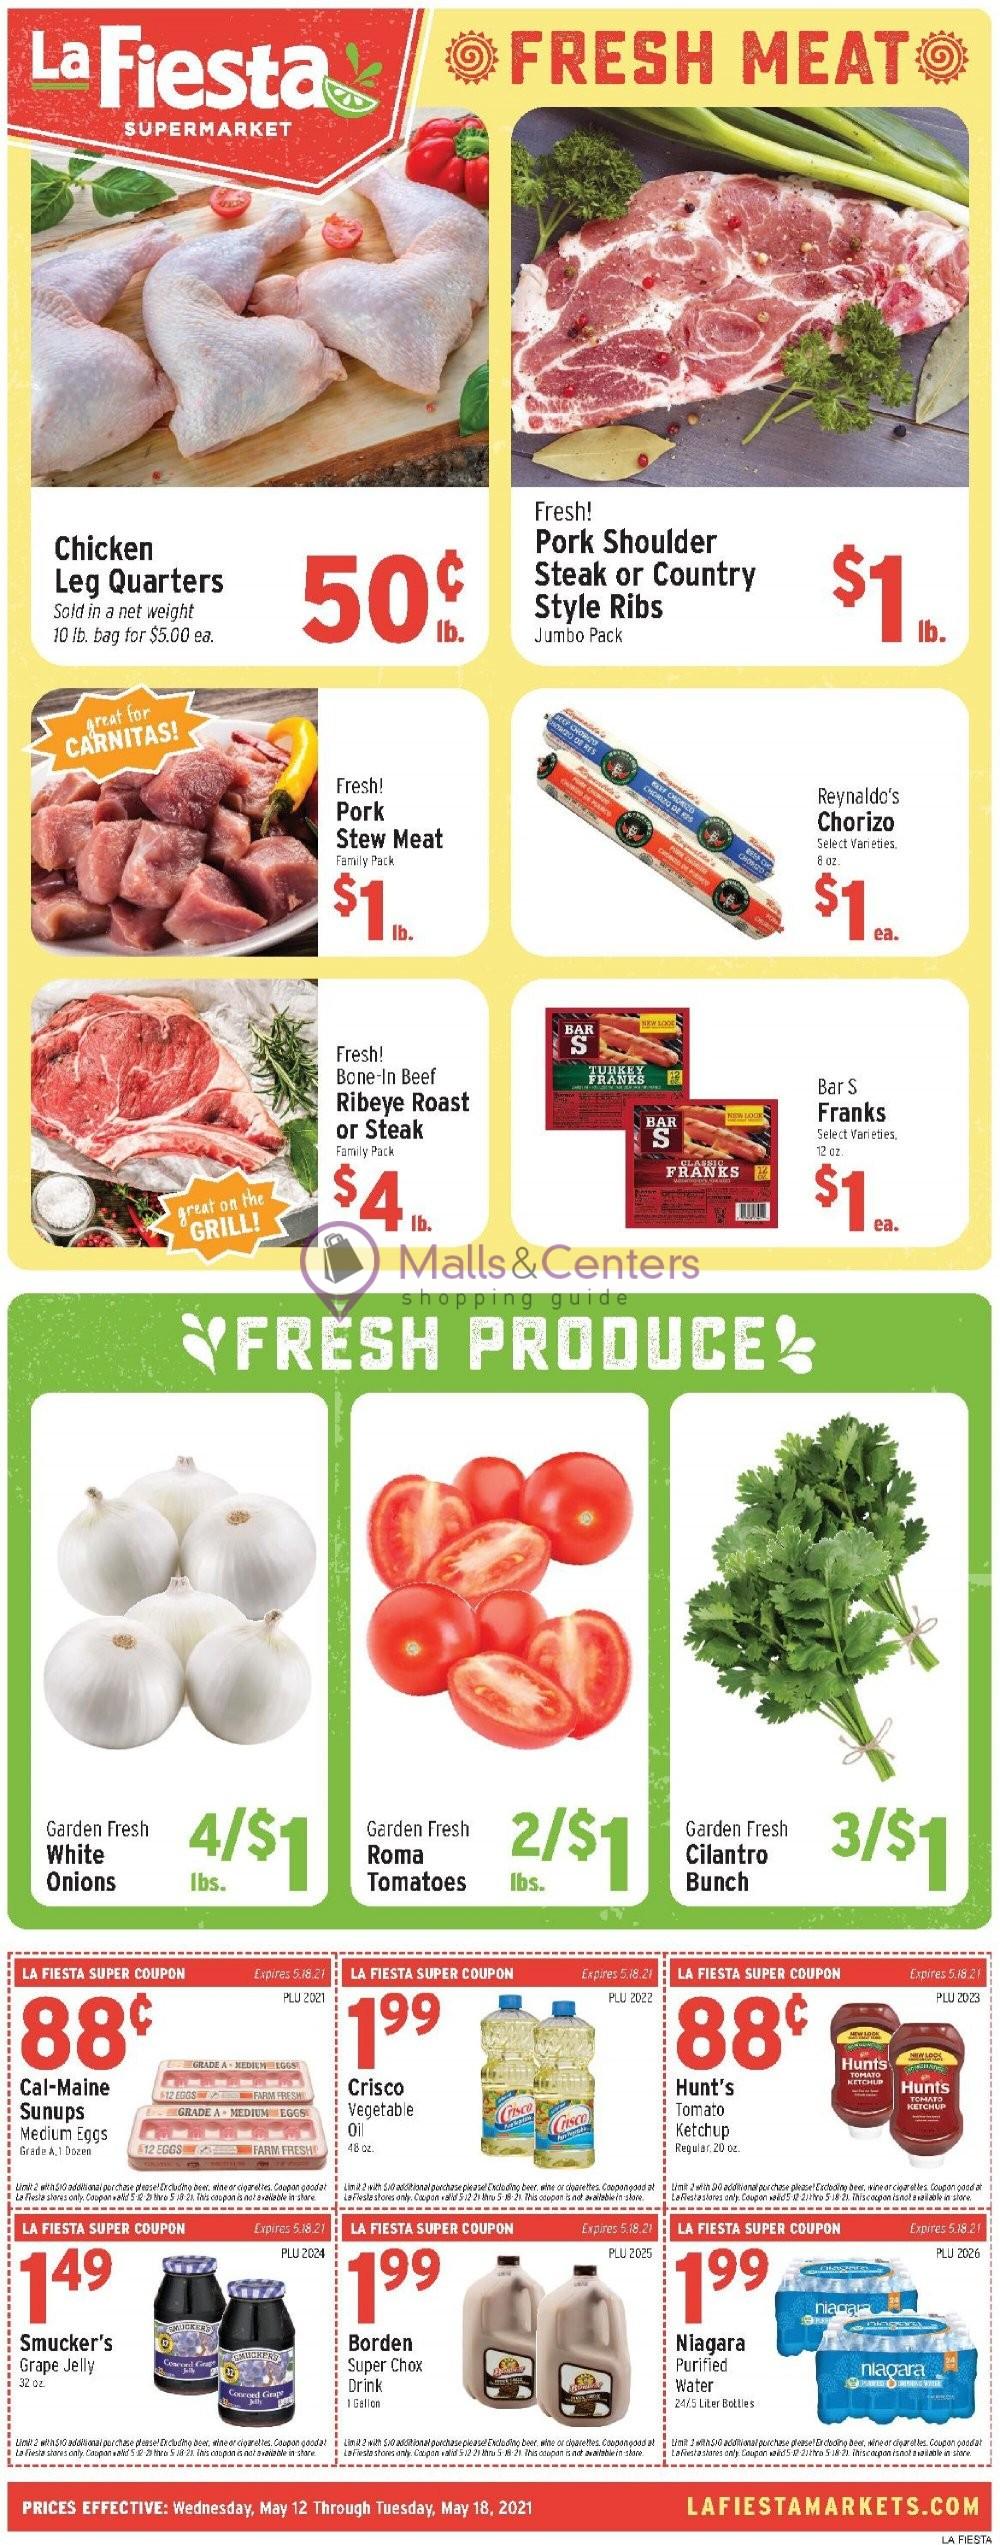 weekly ads La Fiesta Supermarket - page 1 - mallscenters.com